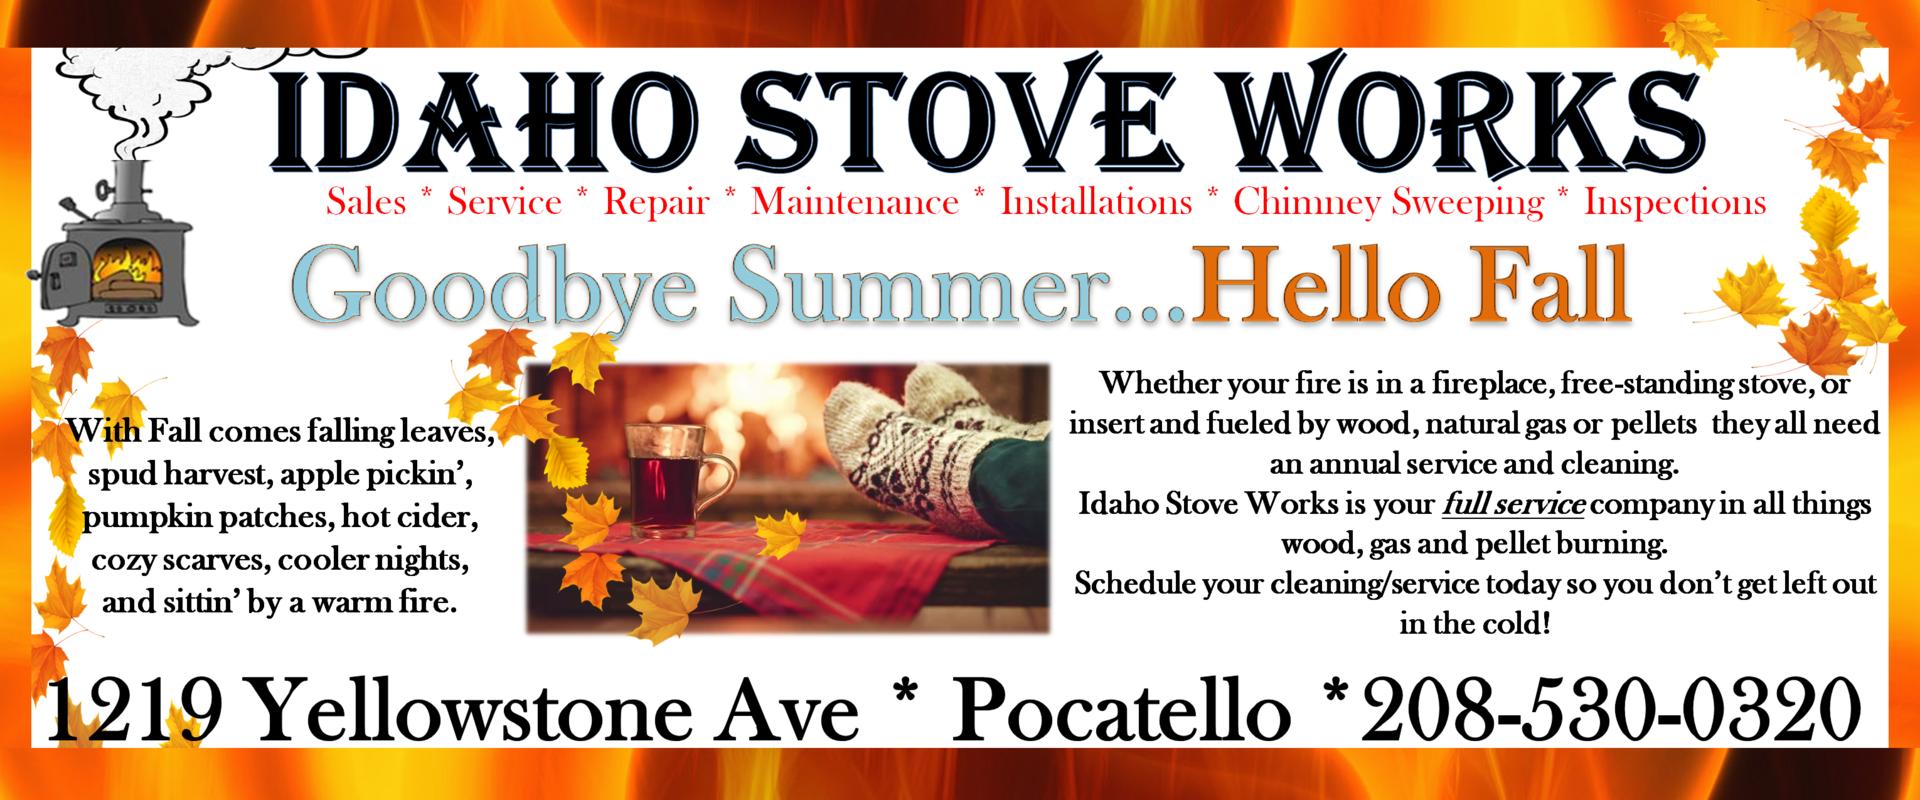 idaho stove works in pocatello id